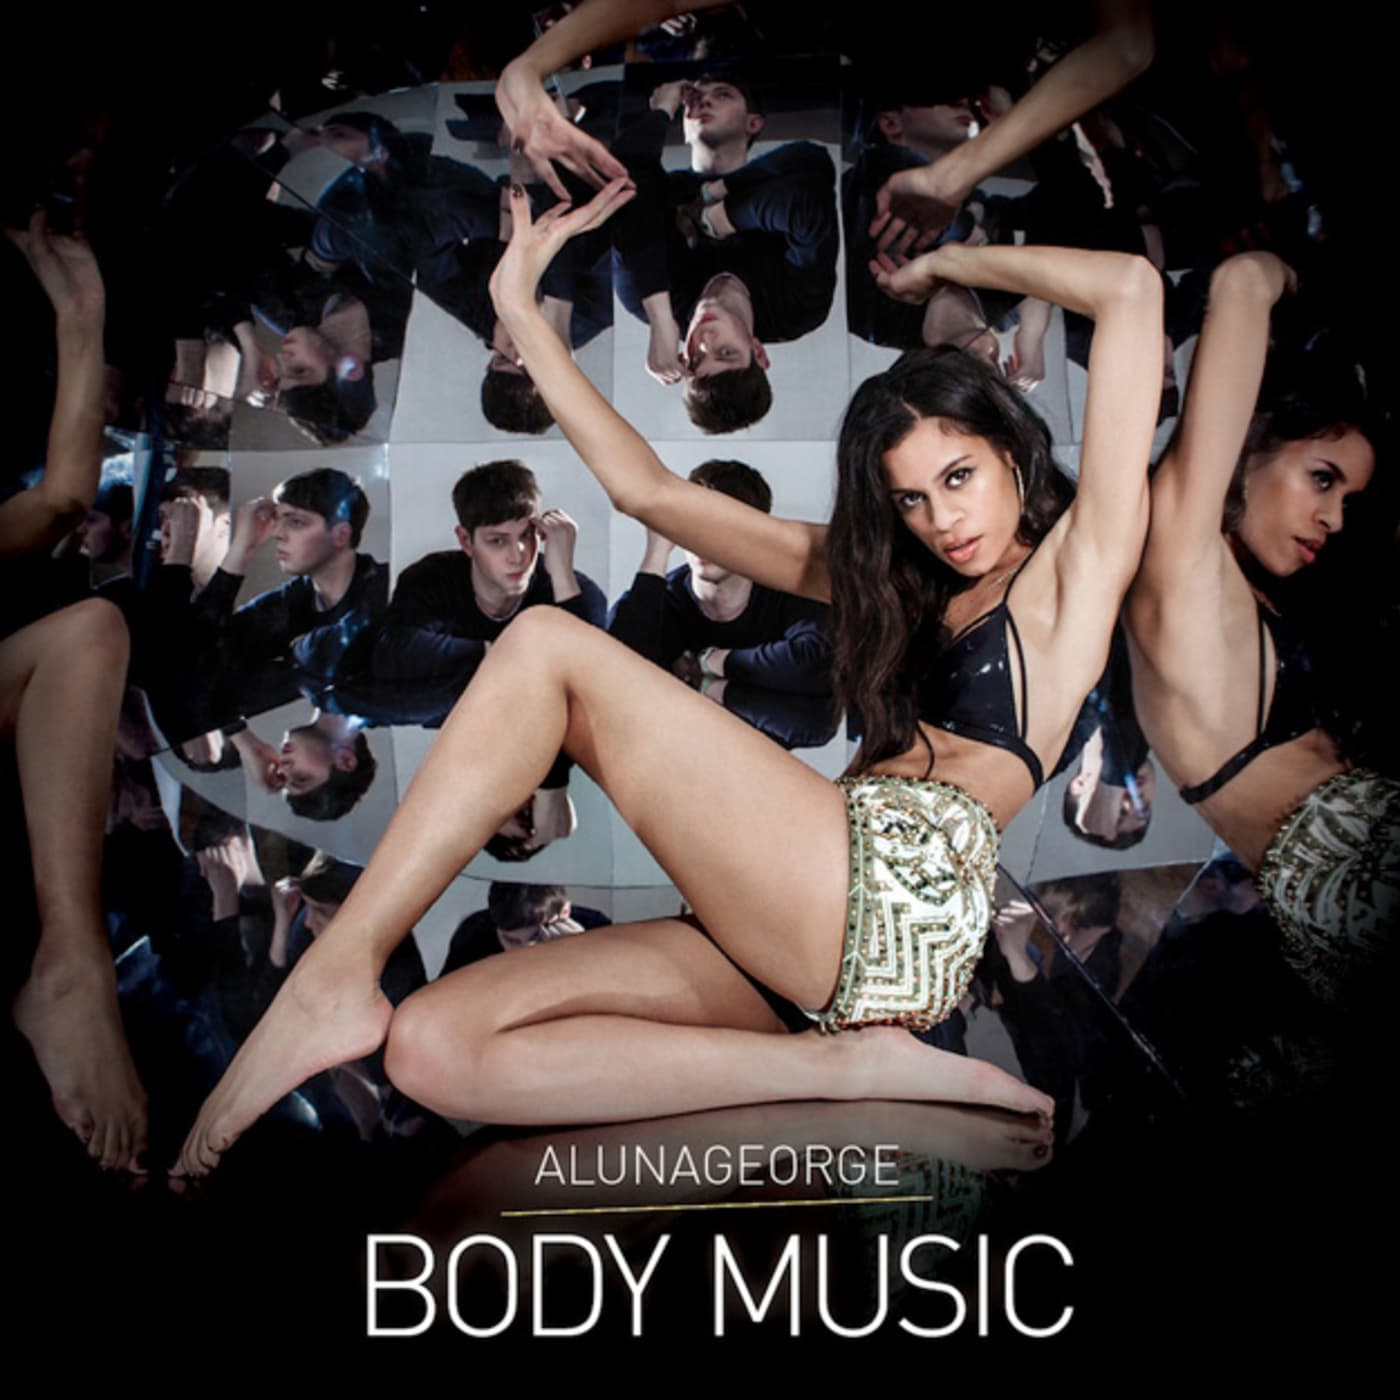 alunageorge body music cover